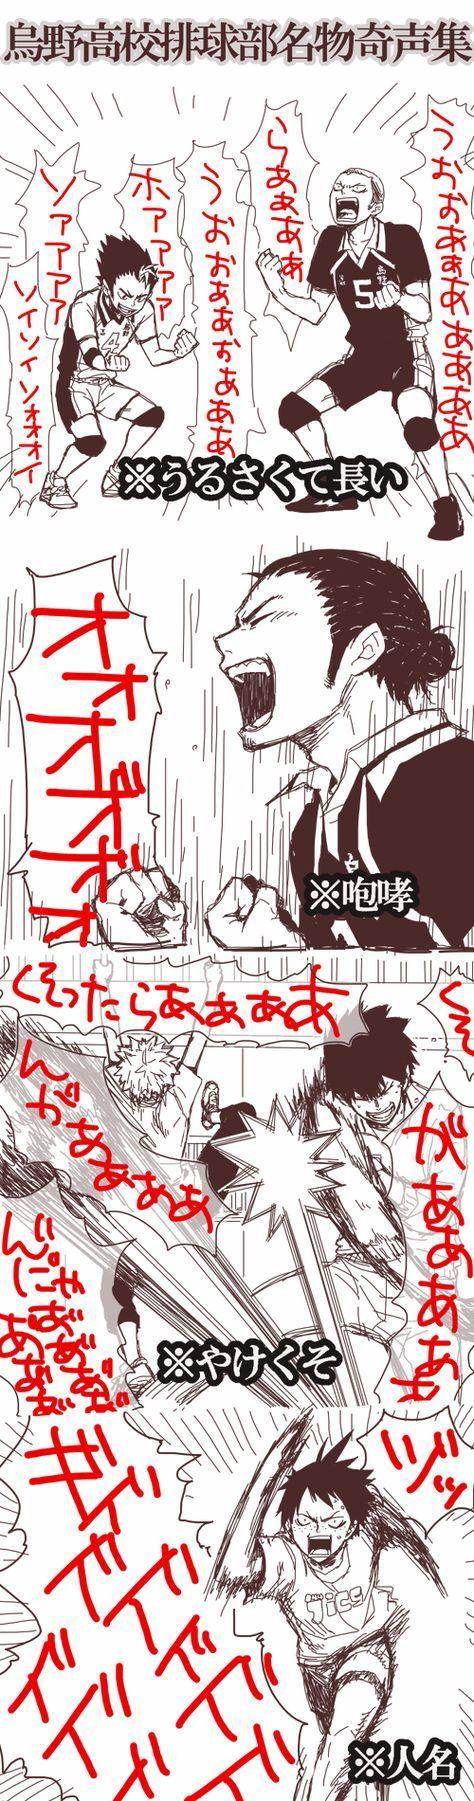 「HQついろぐ②」/「yuki」の漫画 [pixiv] Now that's the spirit